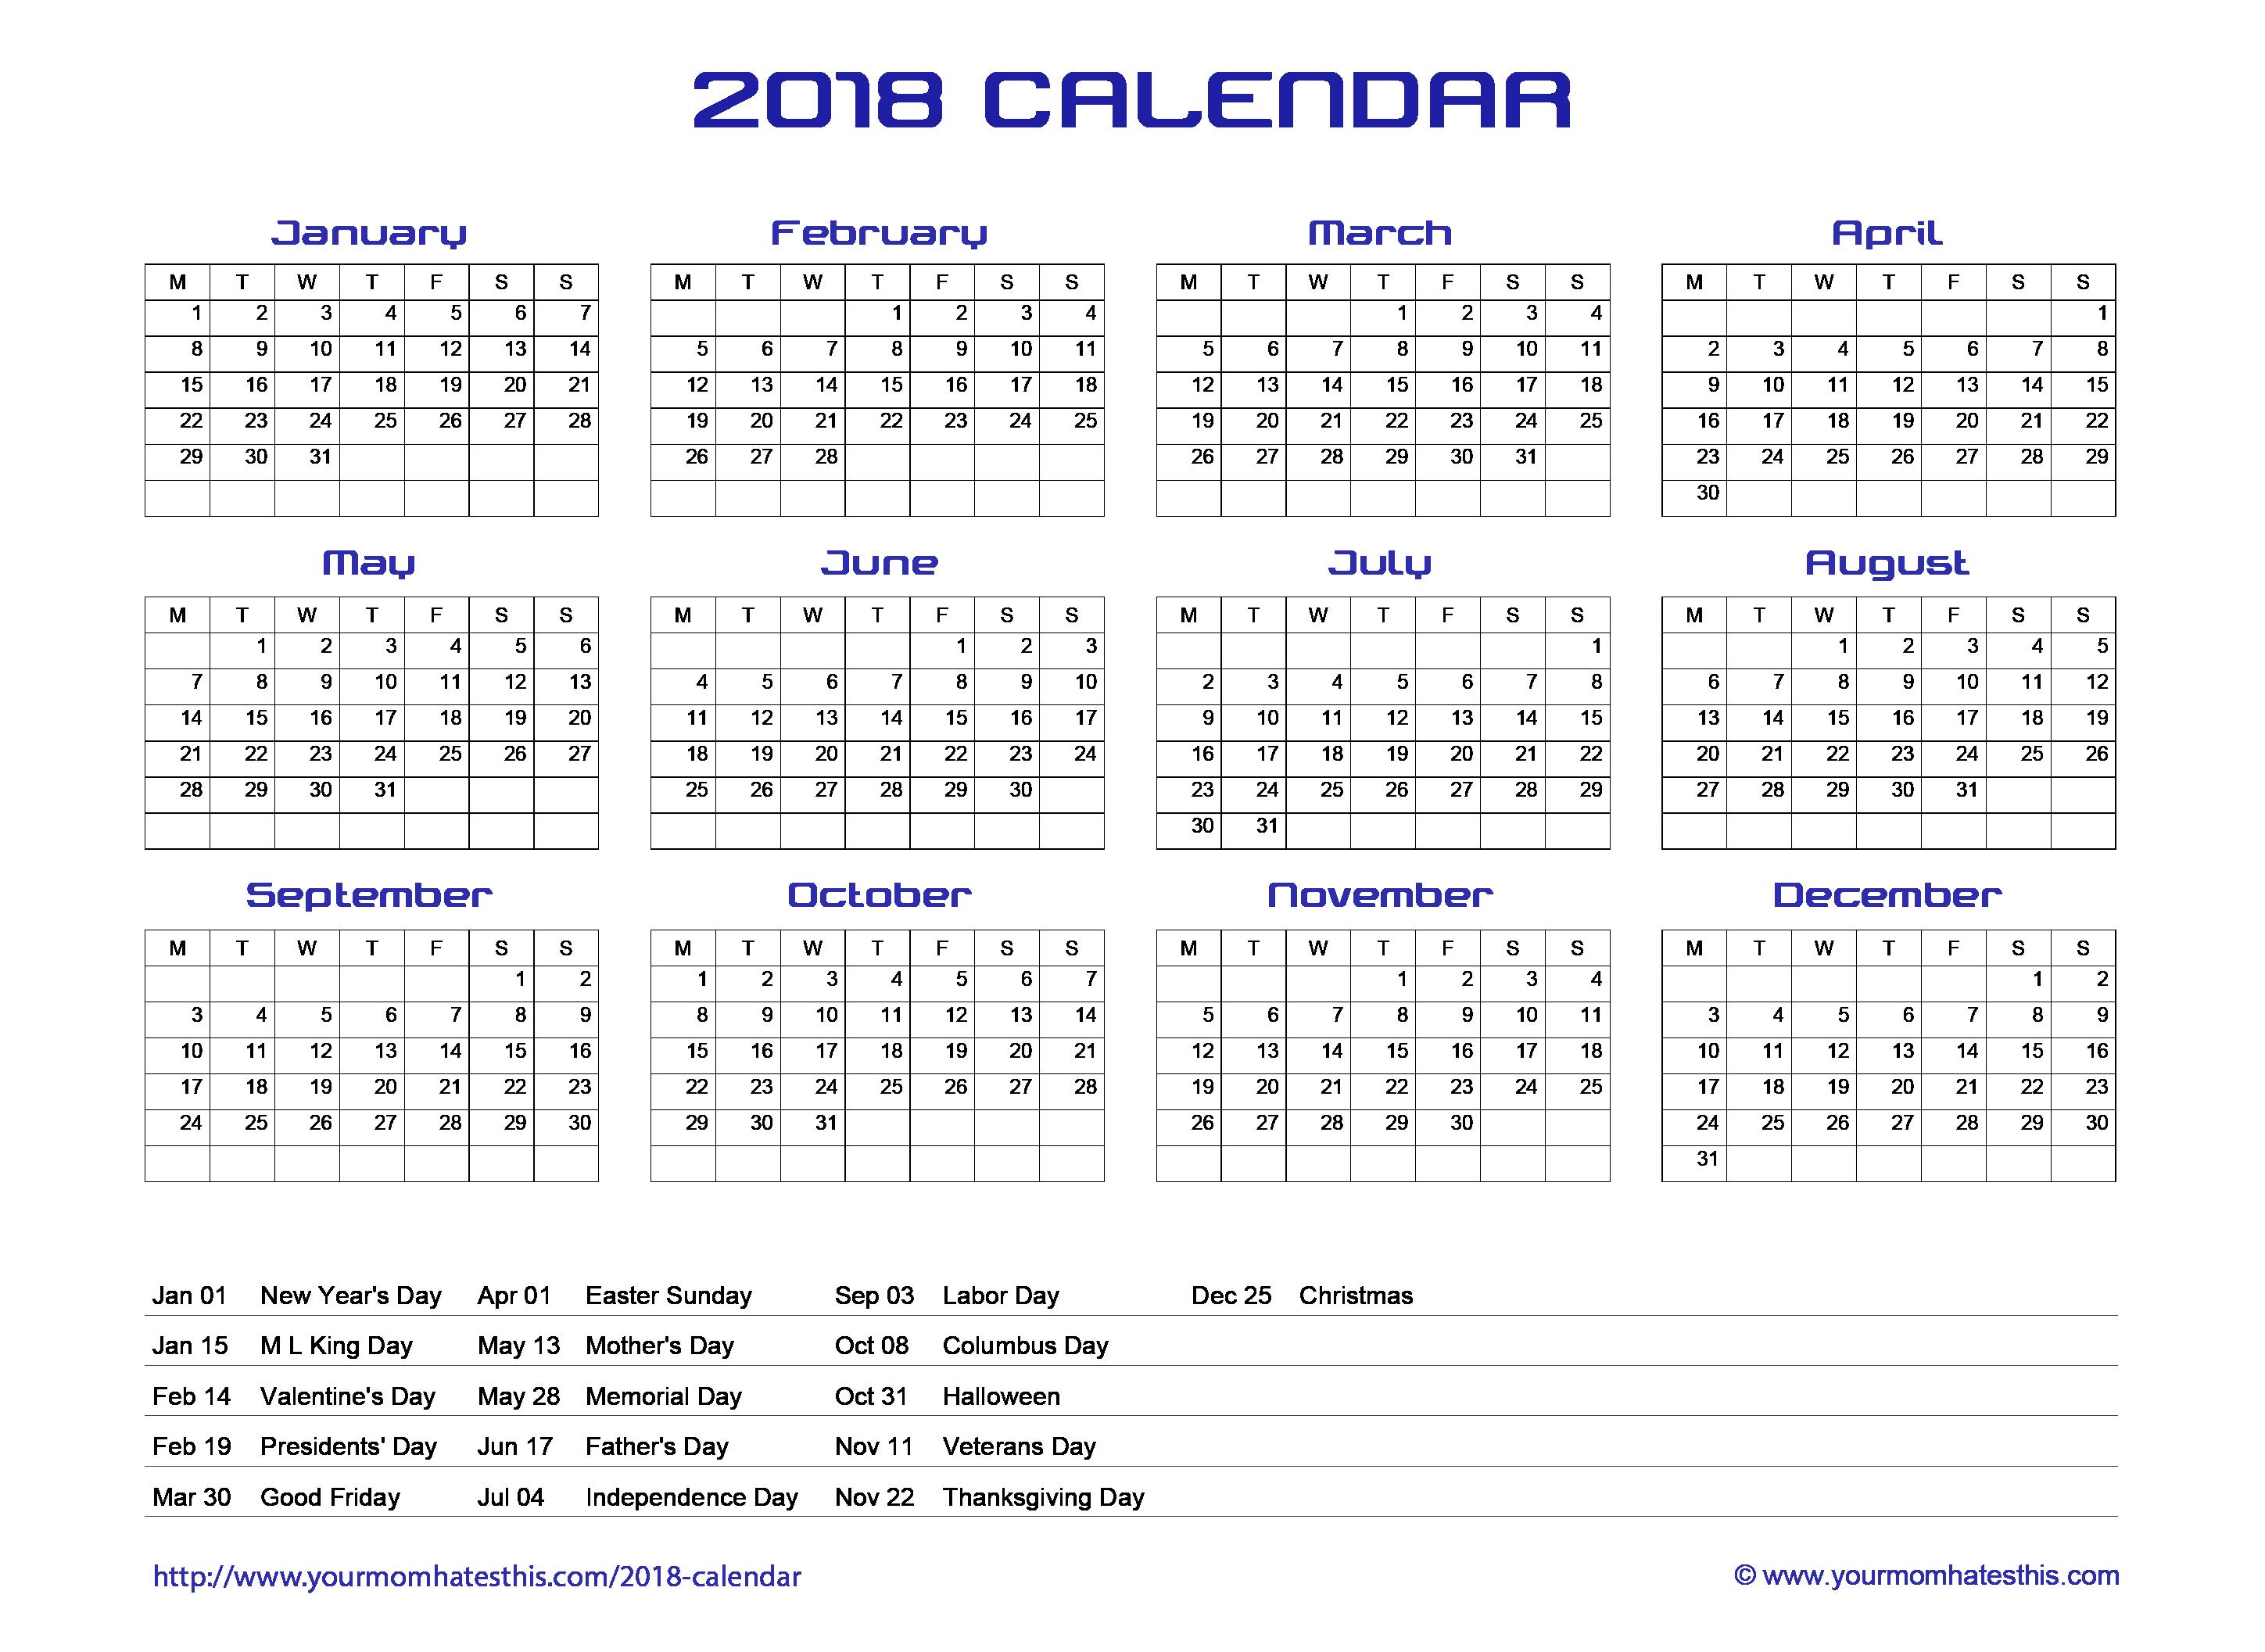 2018 calendar quality calendars pictures